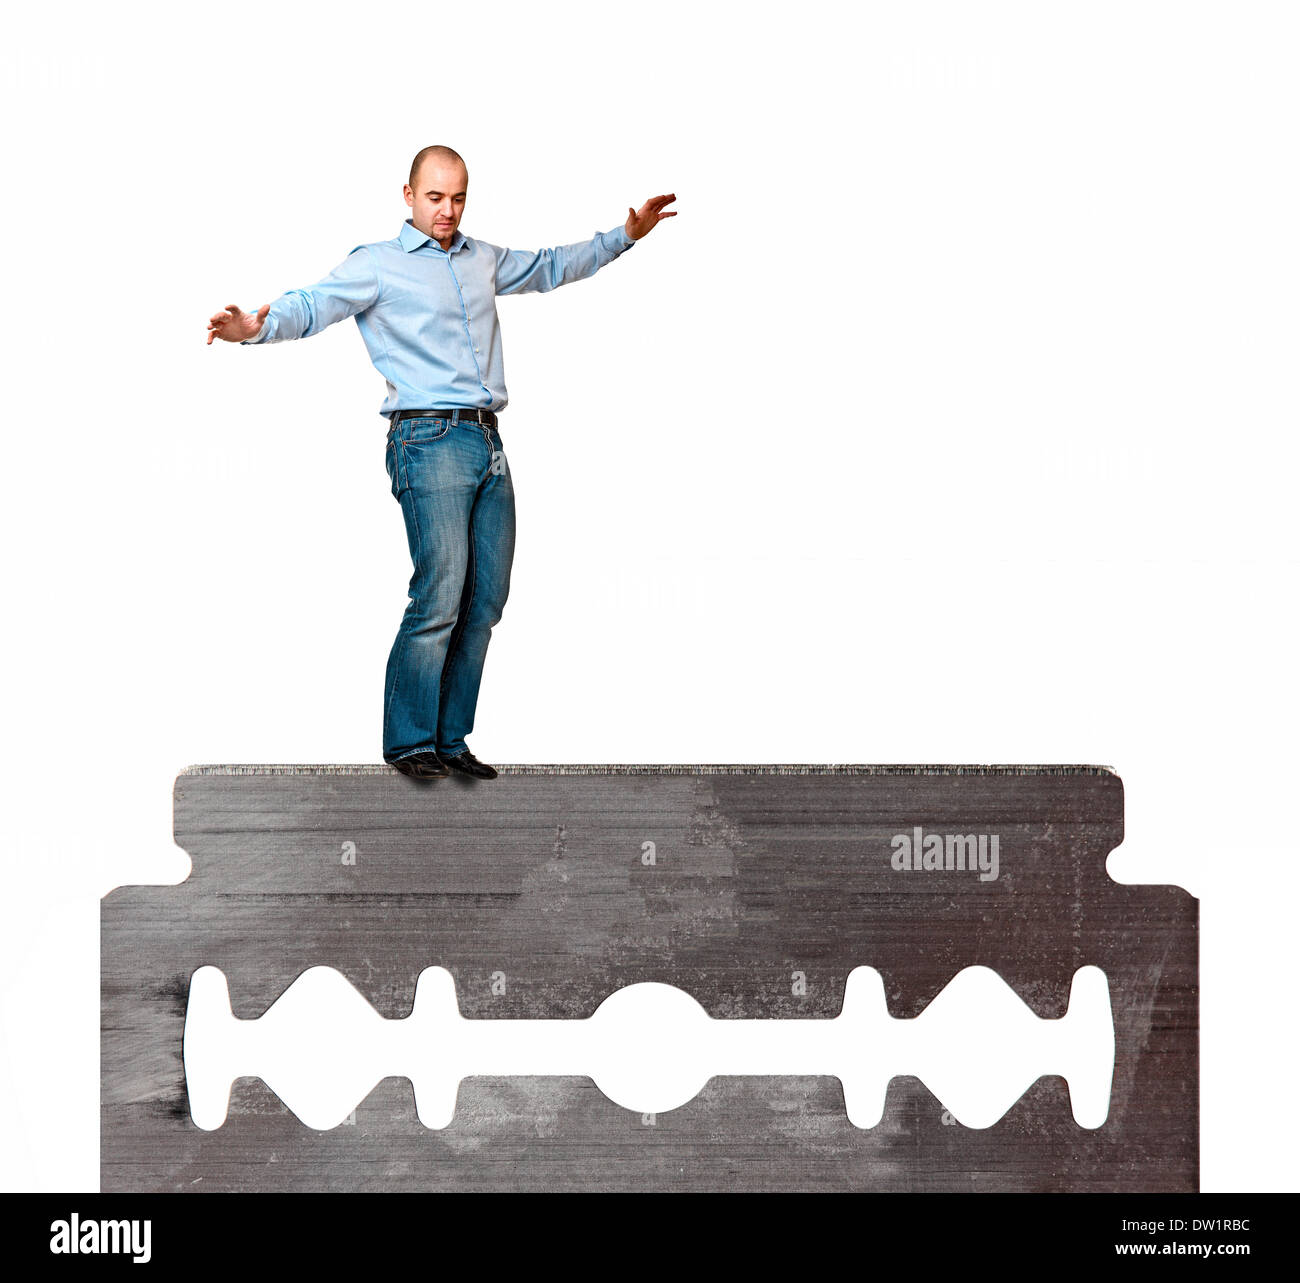 man on blade - Stock Image